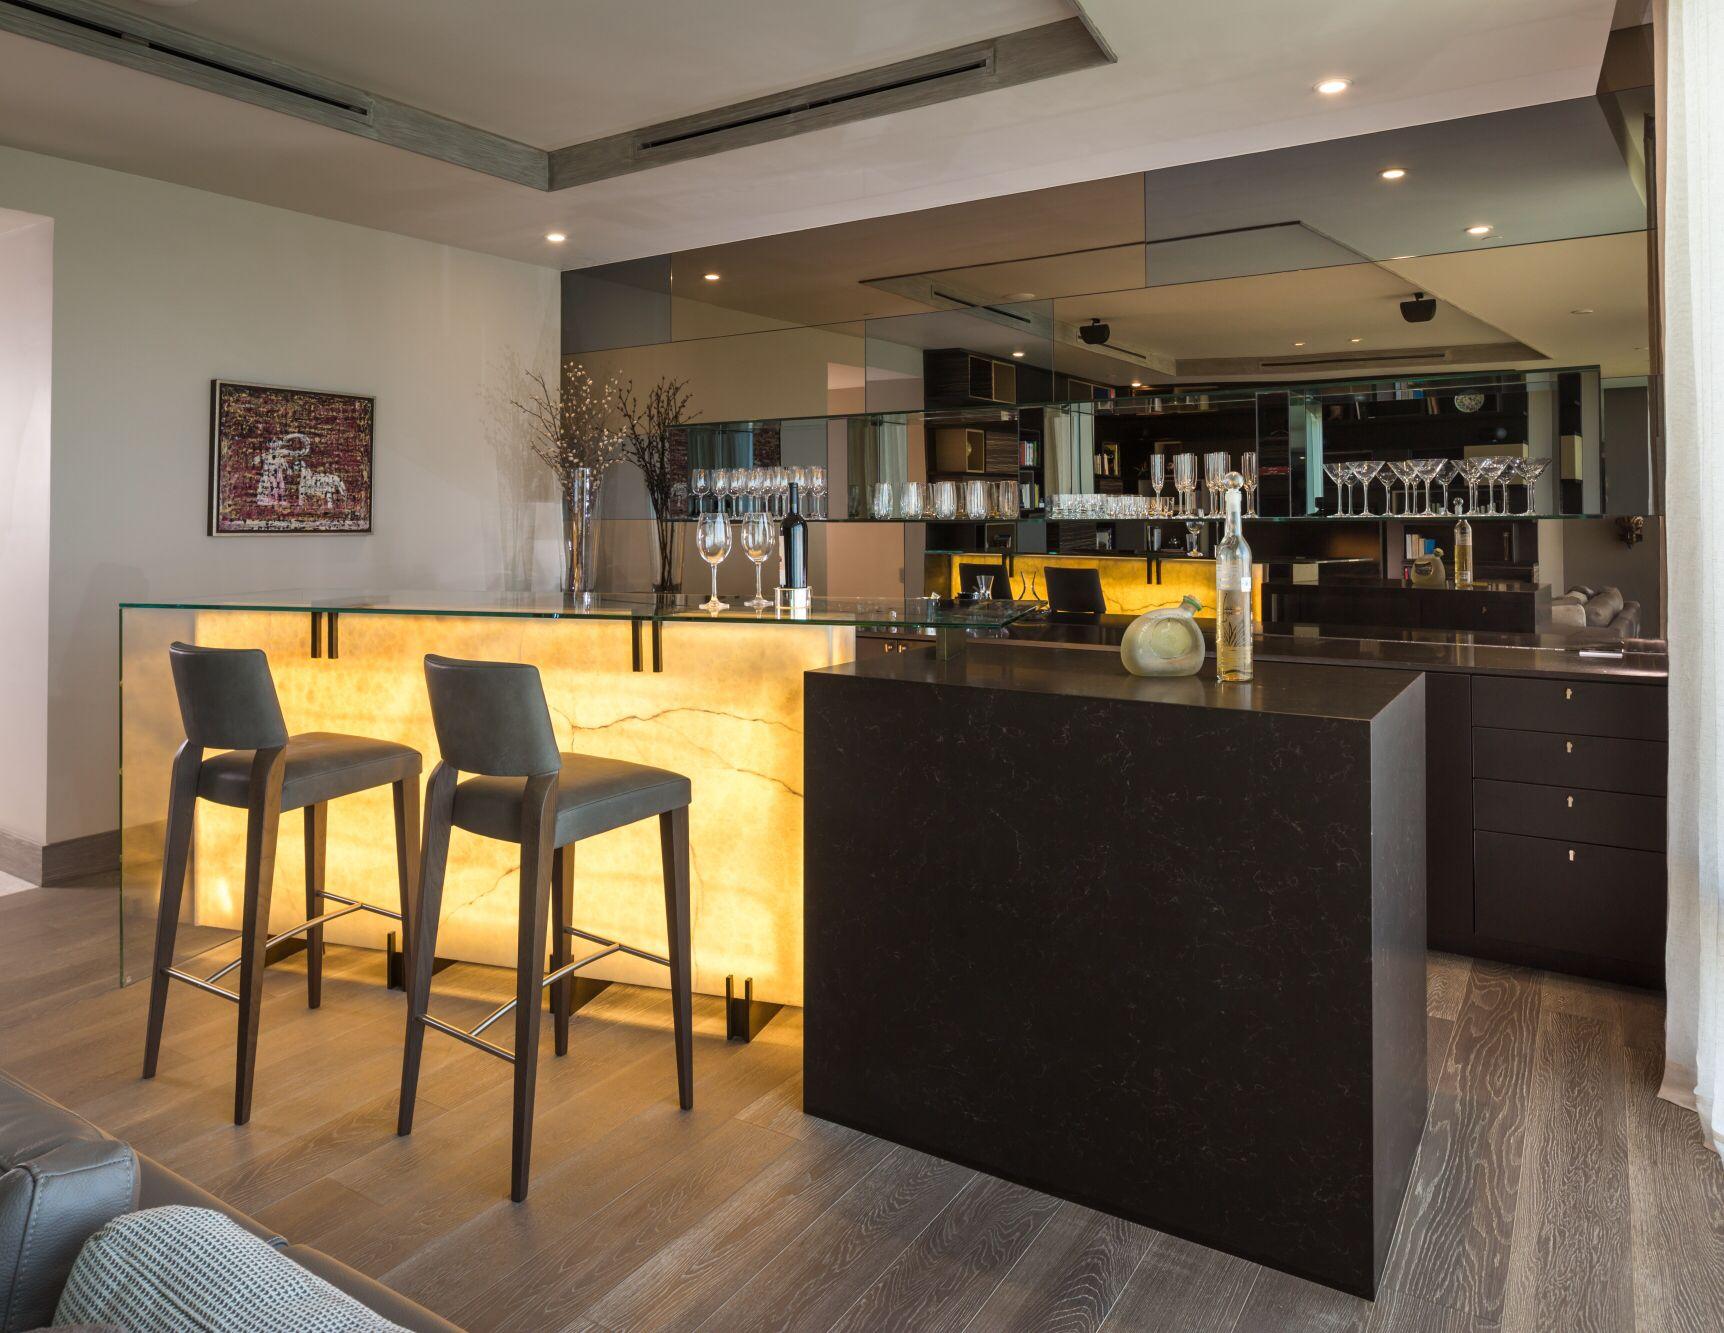 Dise o de bar en rea social se dise una barra especial for Diseno de barras de bar